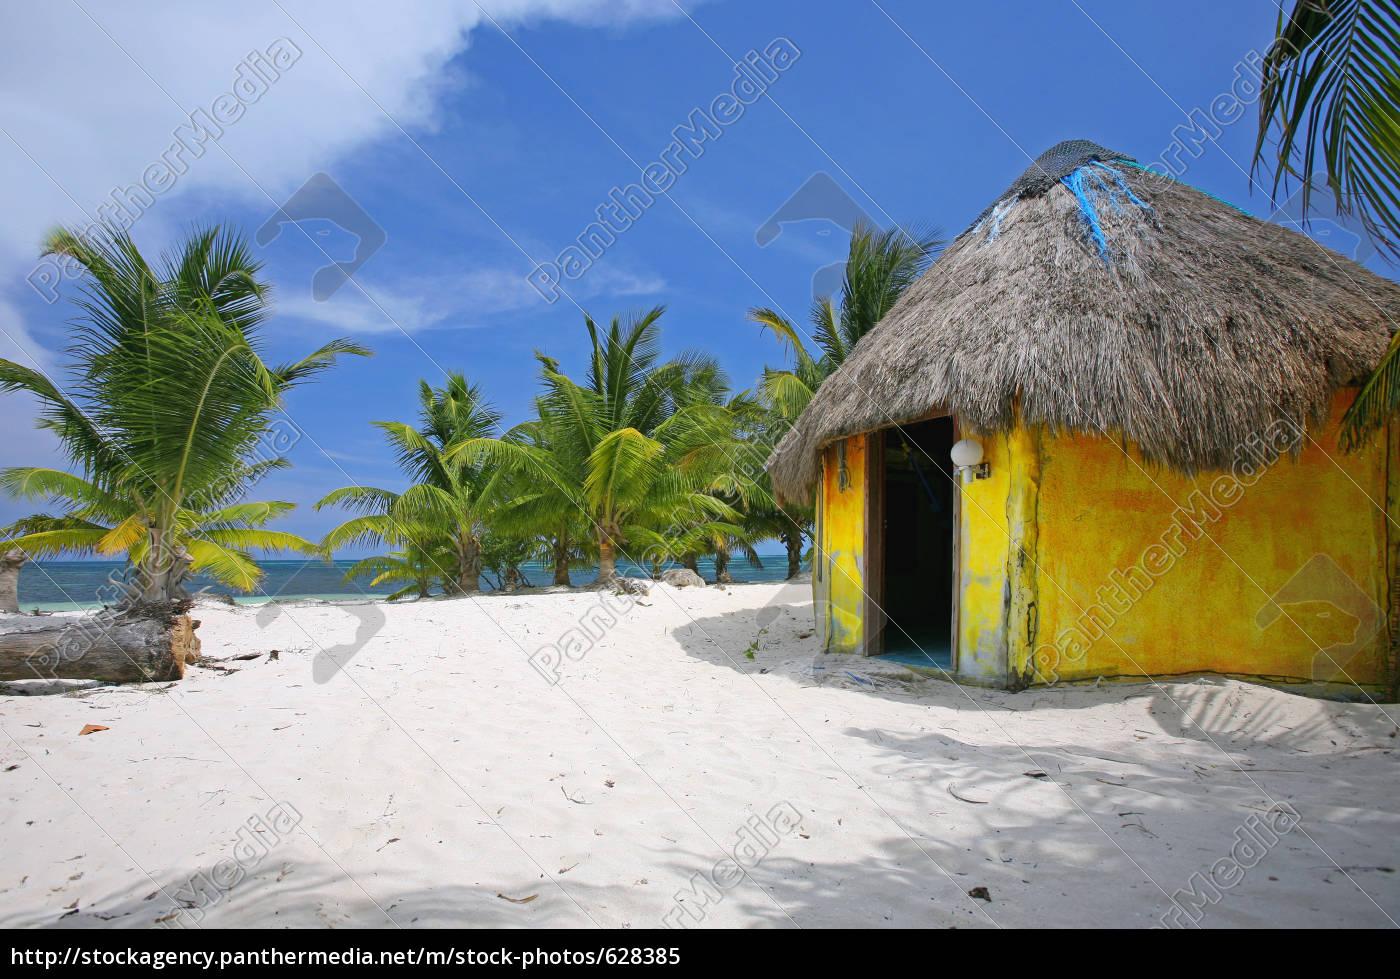 mexican, cabana - 628385